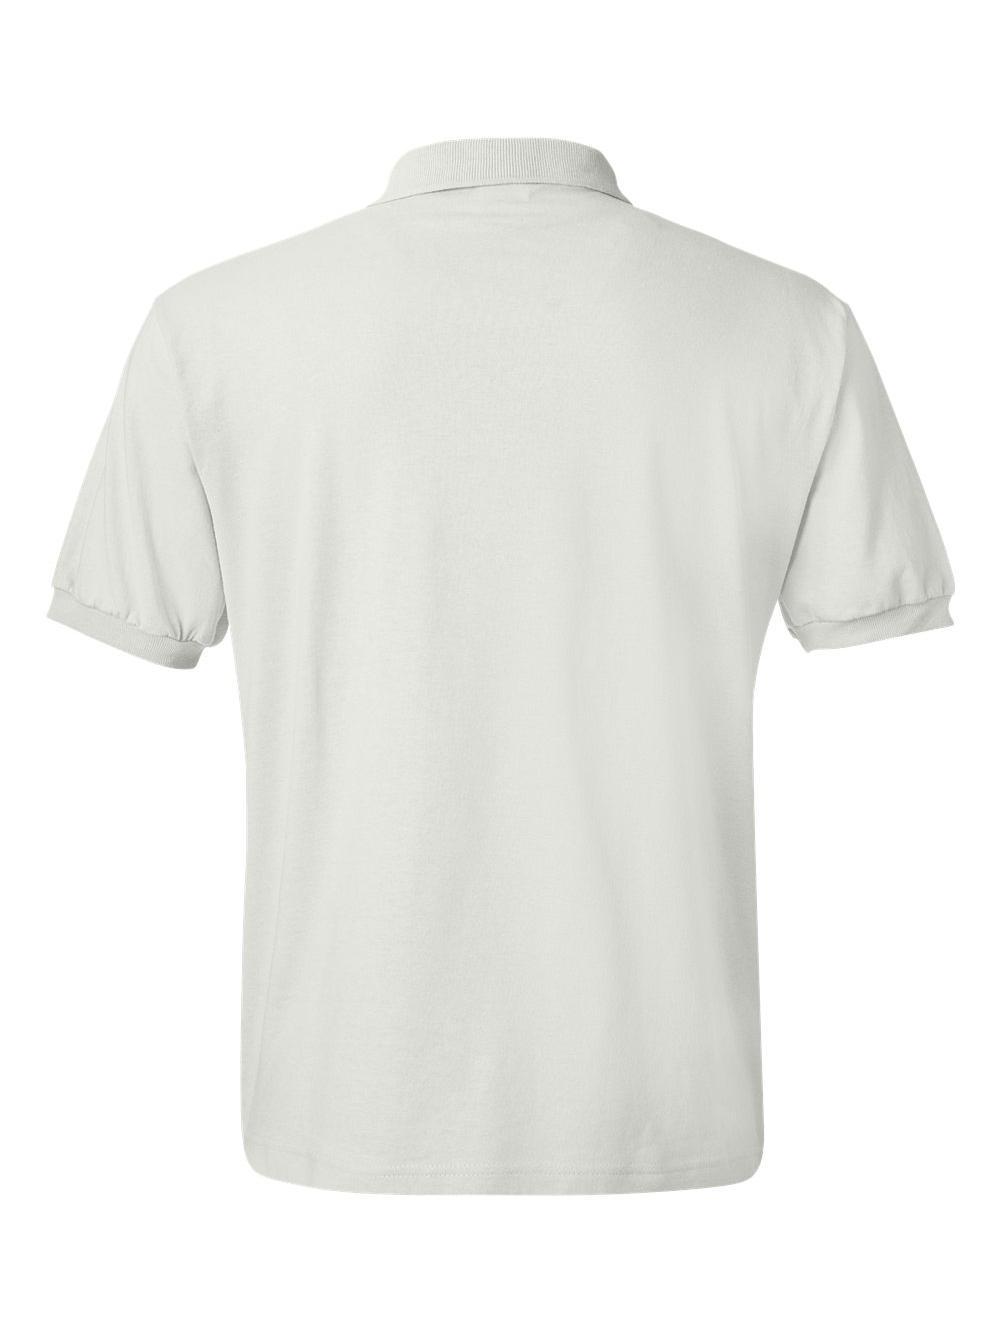 Hanes-Ecosmart-Jersey-Sport-Shirt-054X thumbnail 40